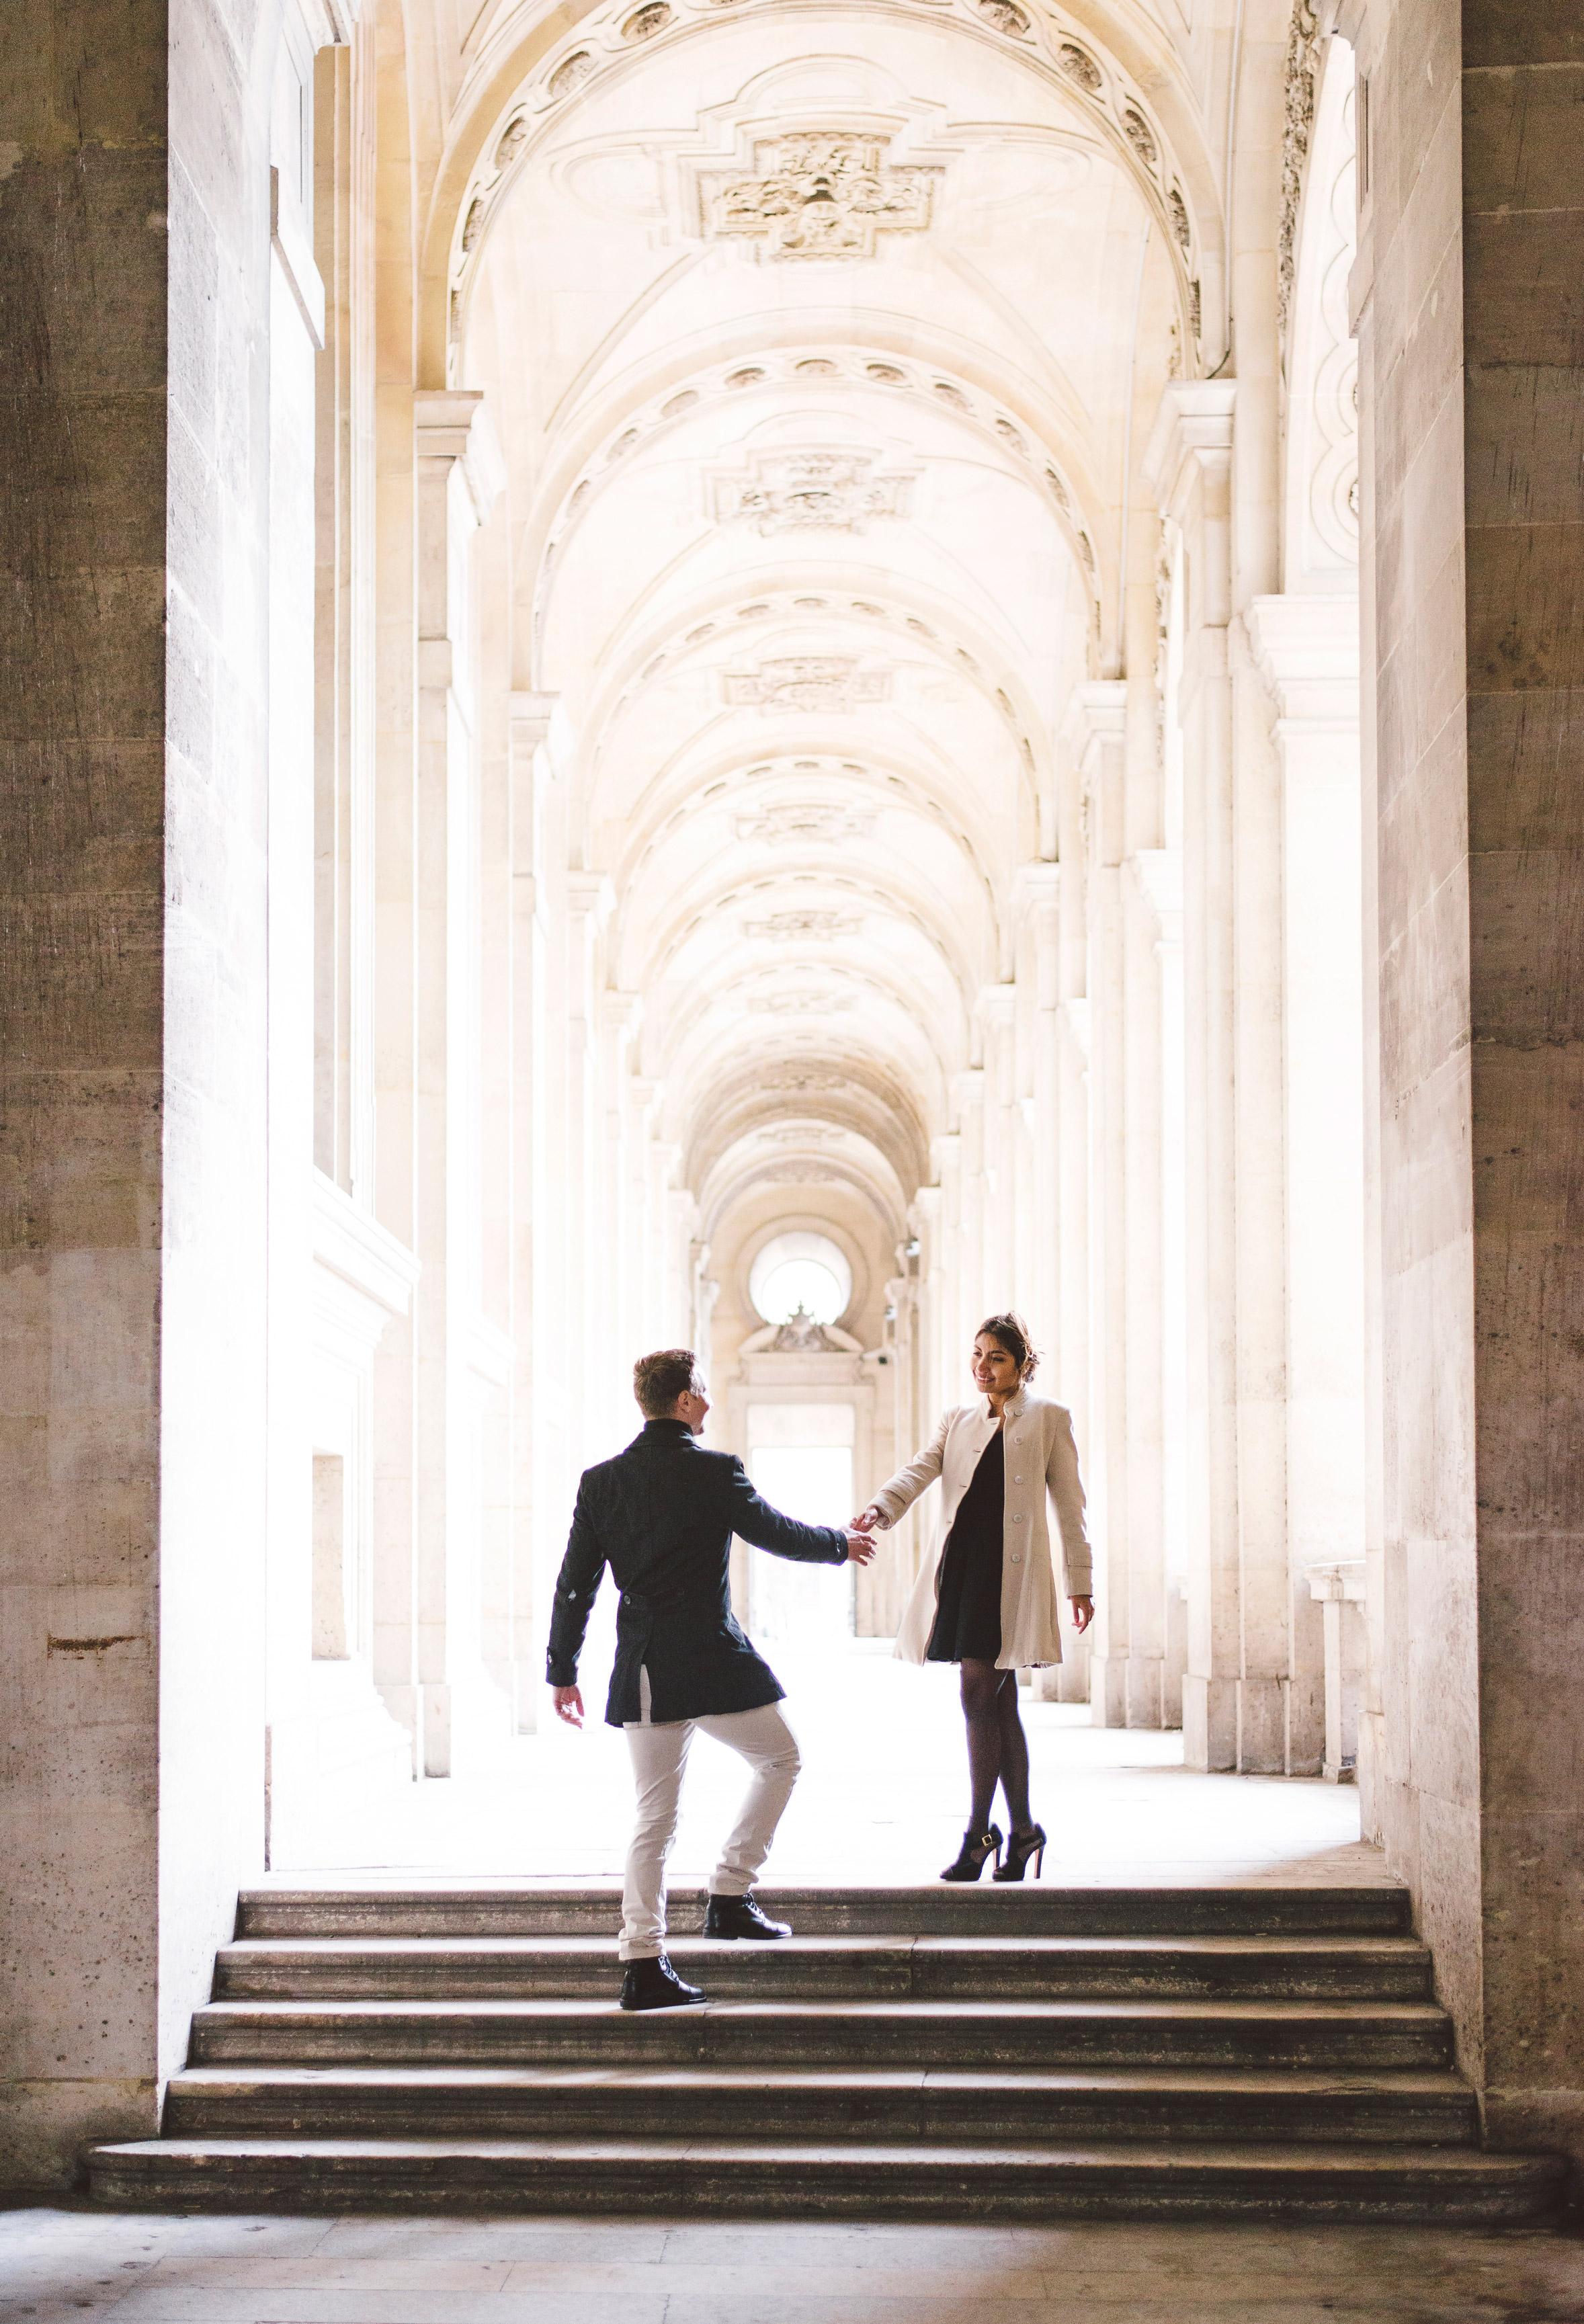 Couple-photoshoot-Anniversary-Paris-Louvre-Tuileries125.jpg